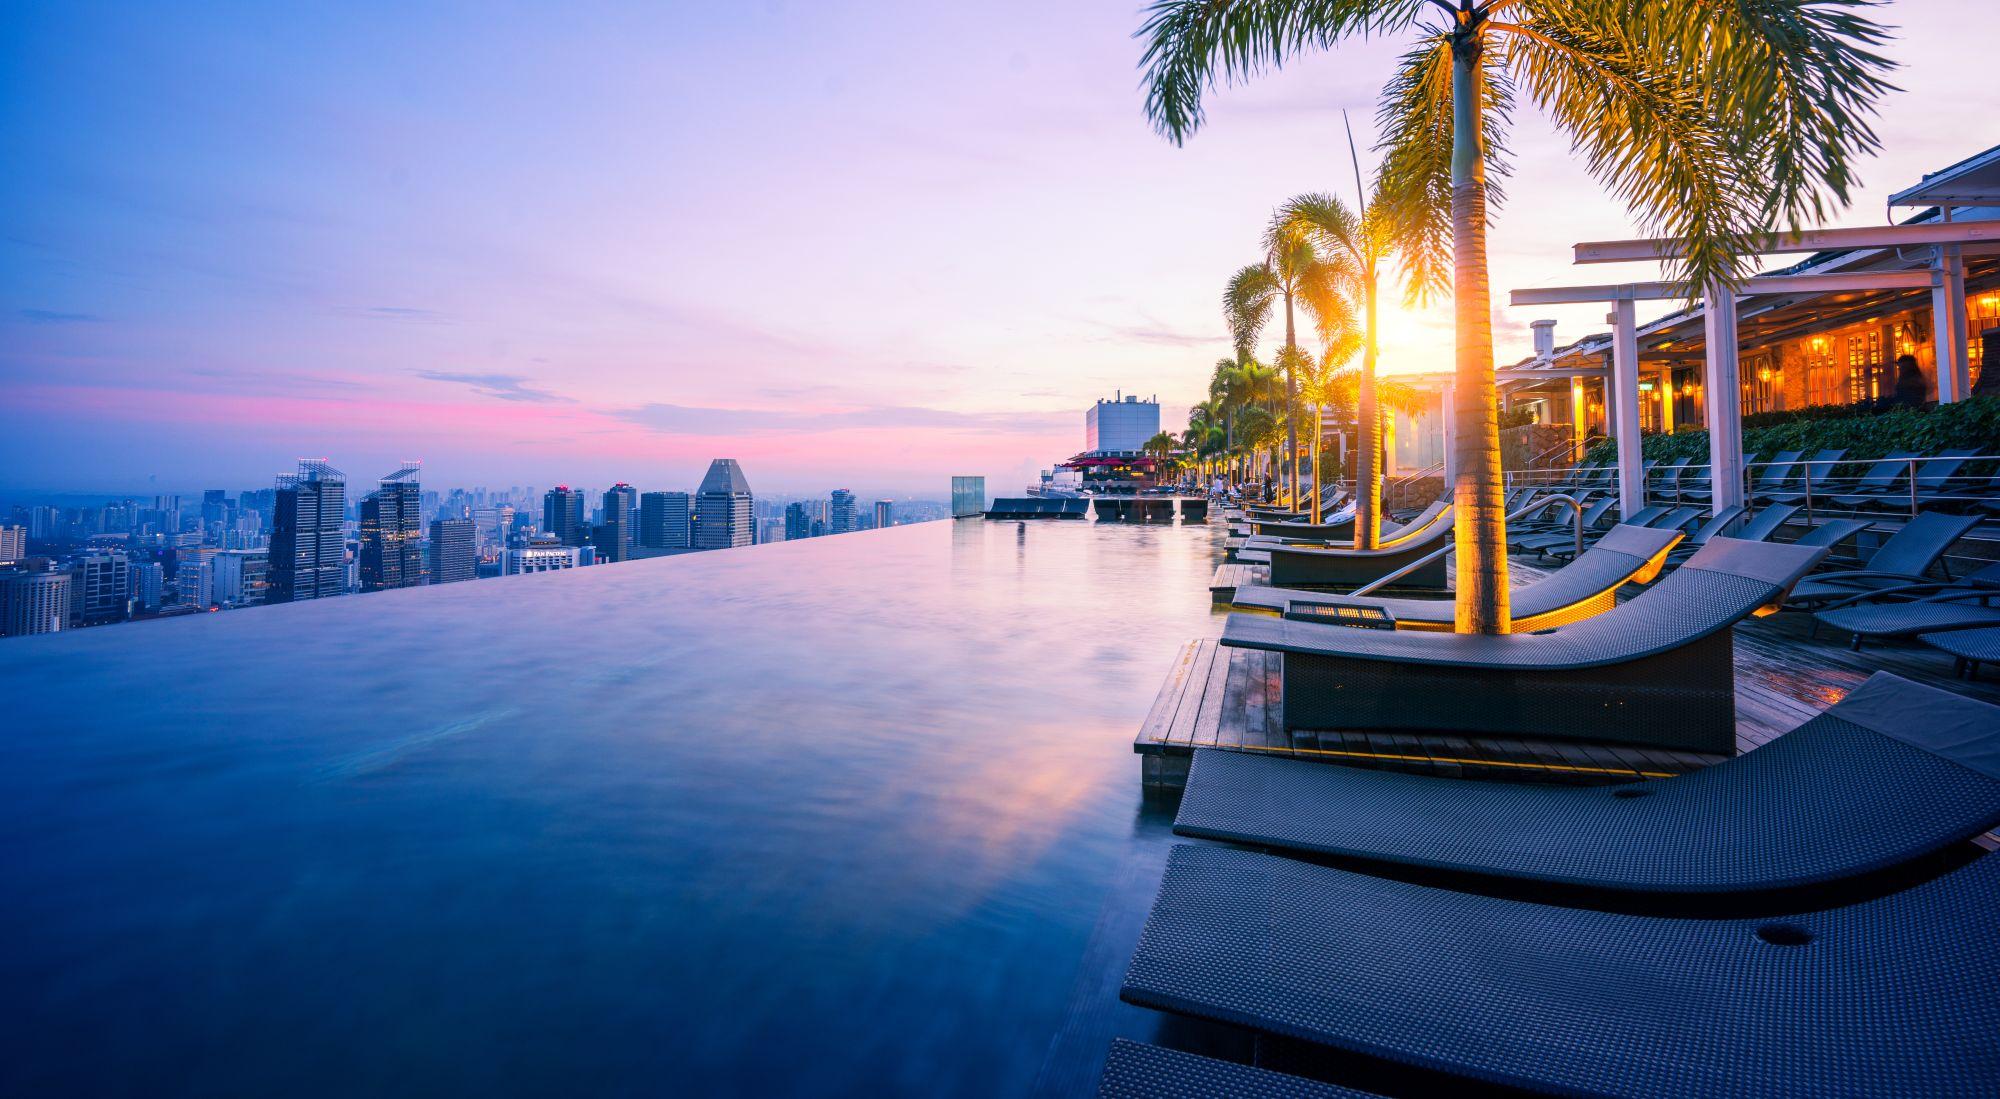 Singapur basen w hotelu